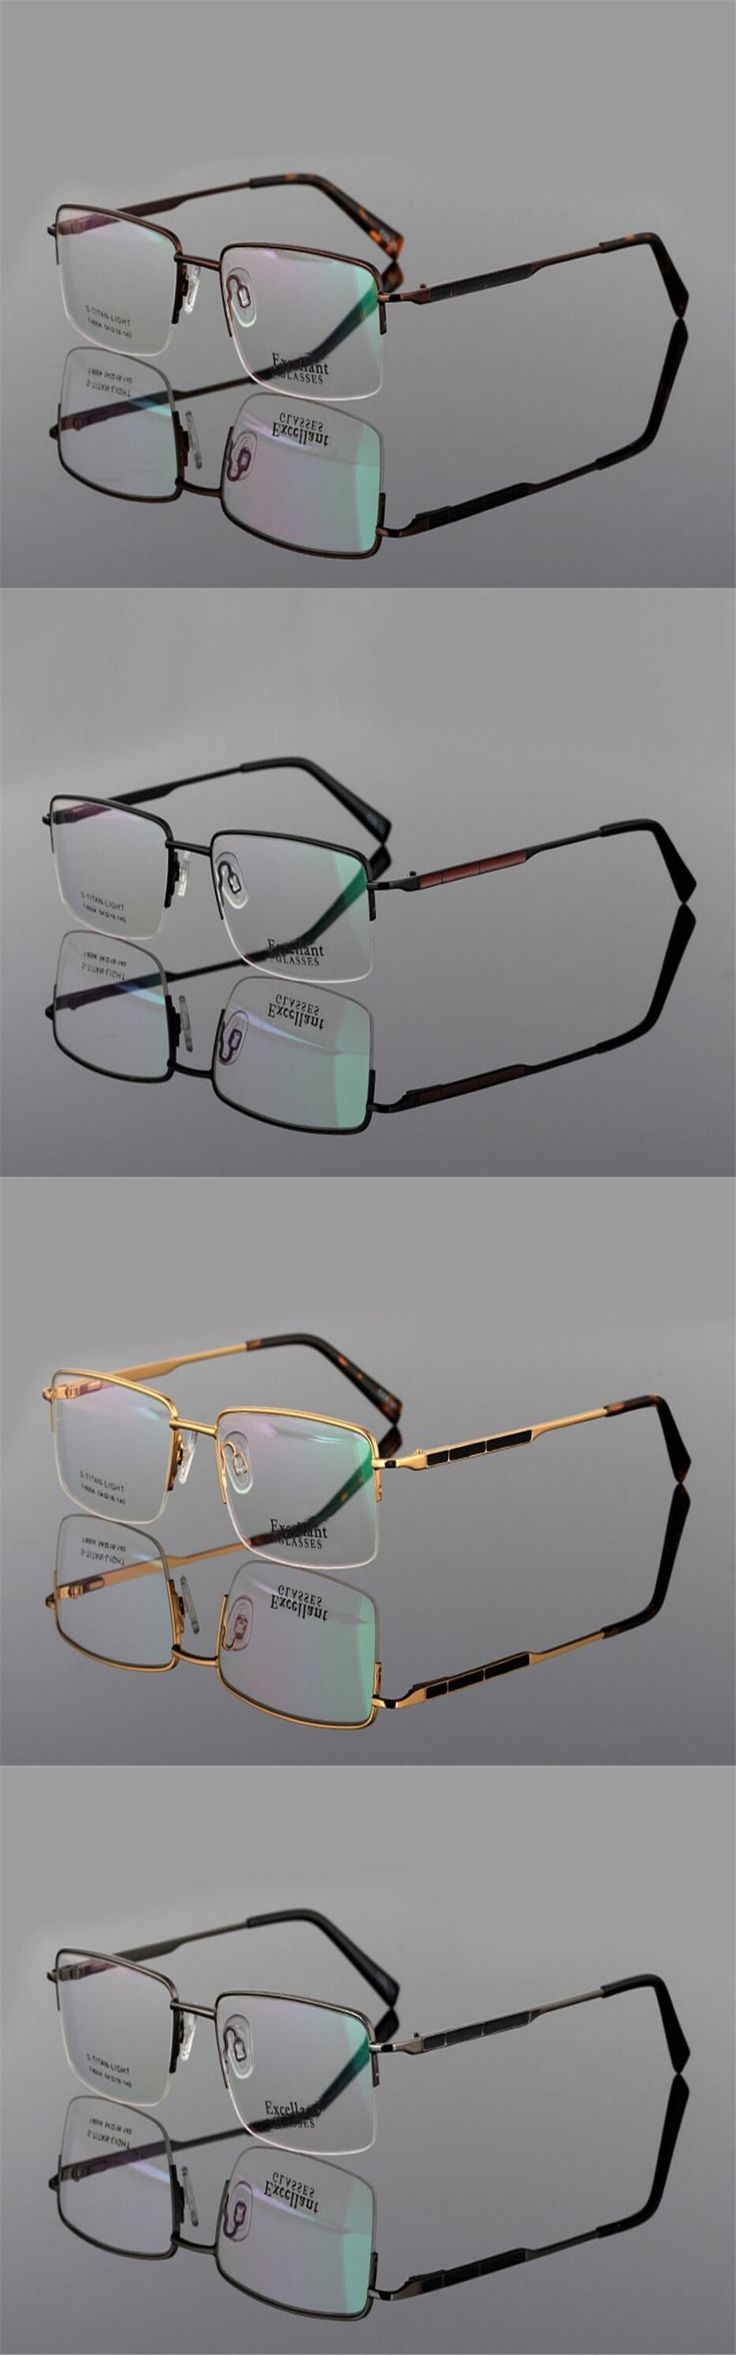 DOWER ME Multi-focal Progressive Lens Men Business Design Half Rim Alloy Presbyopia Reading Eyeglasses Optical Eyewear ZM8004